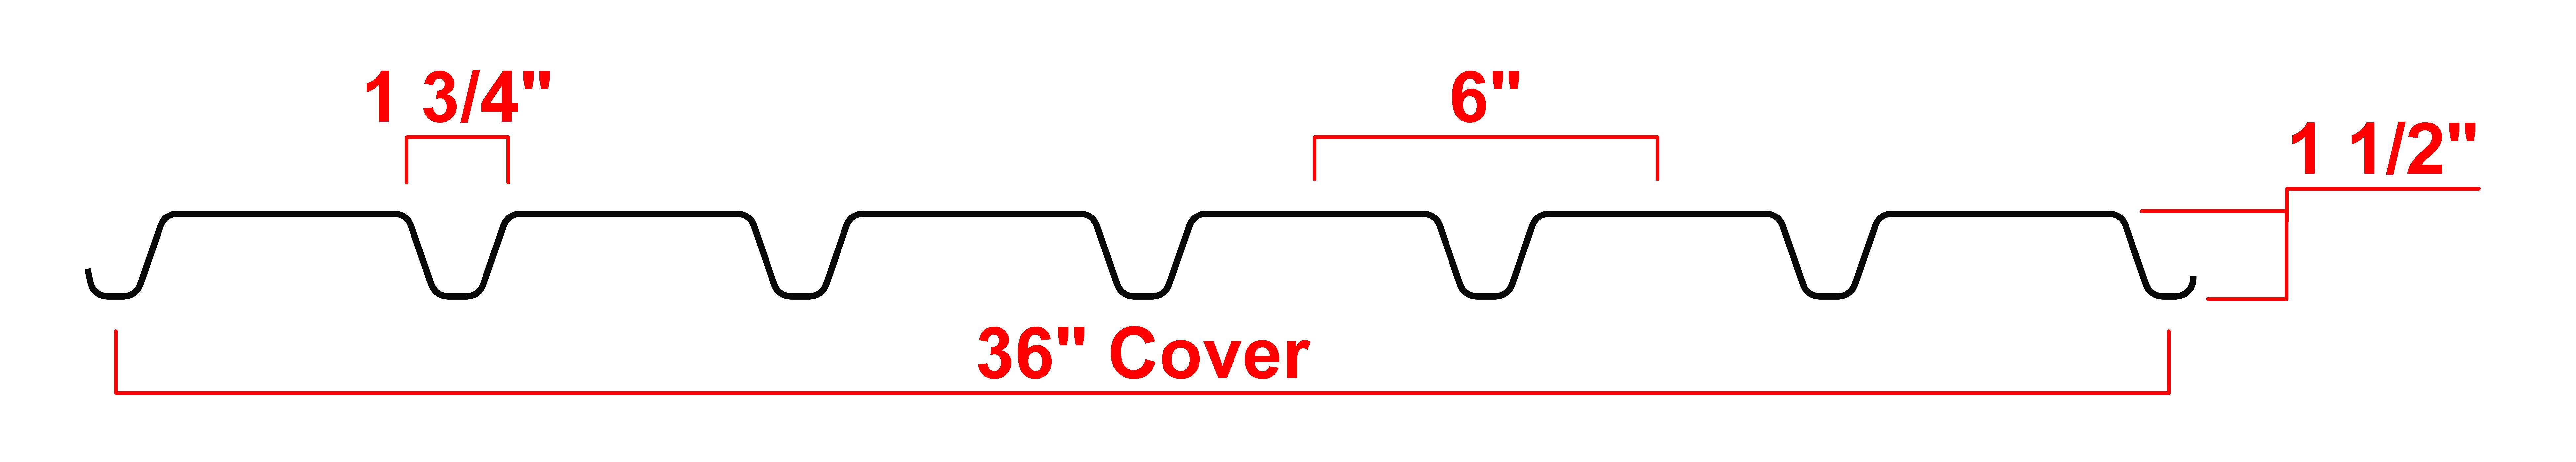 1.5 F Roof Deck Profile